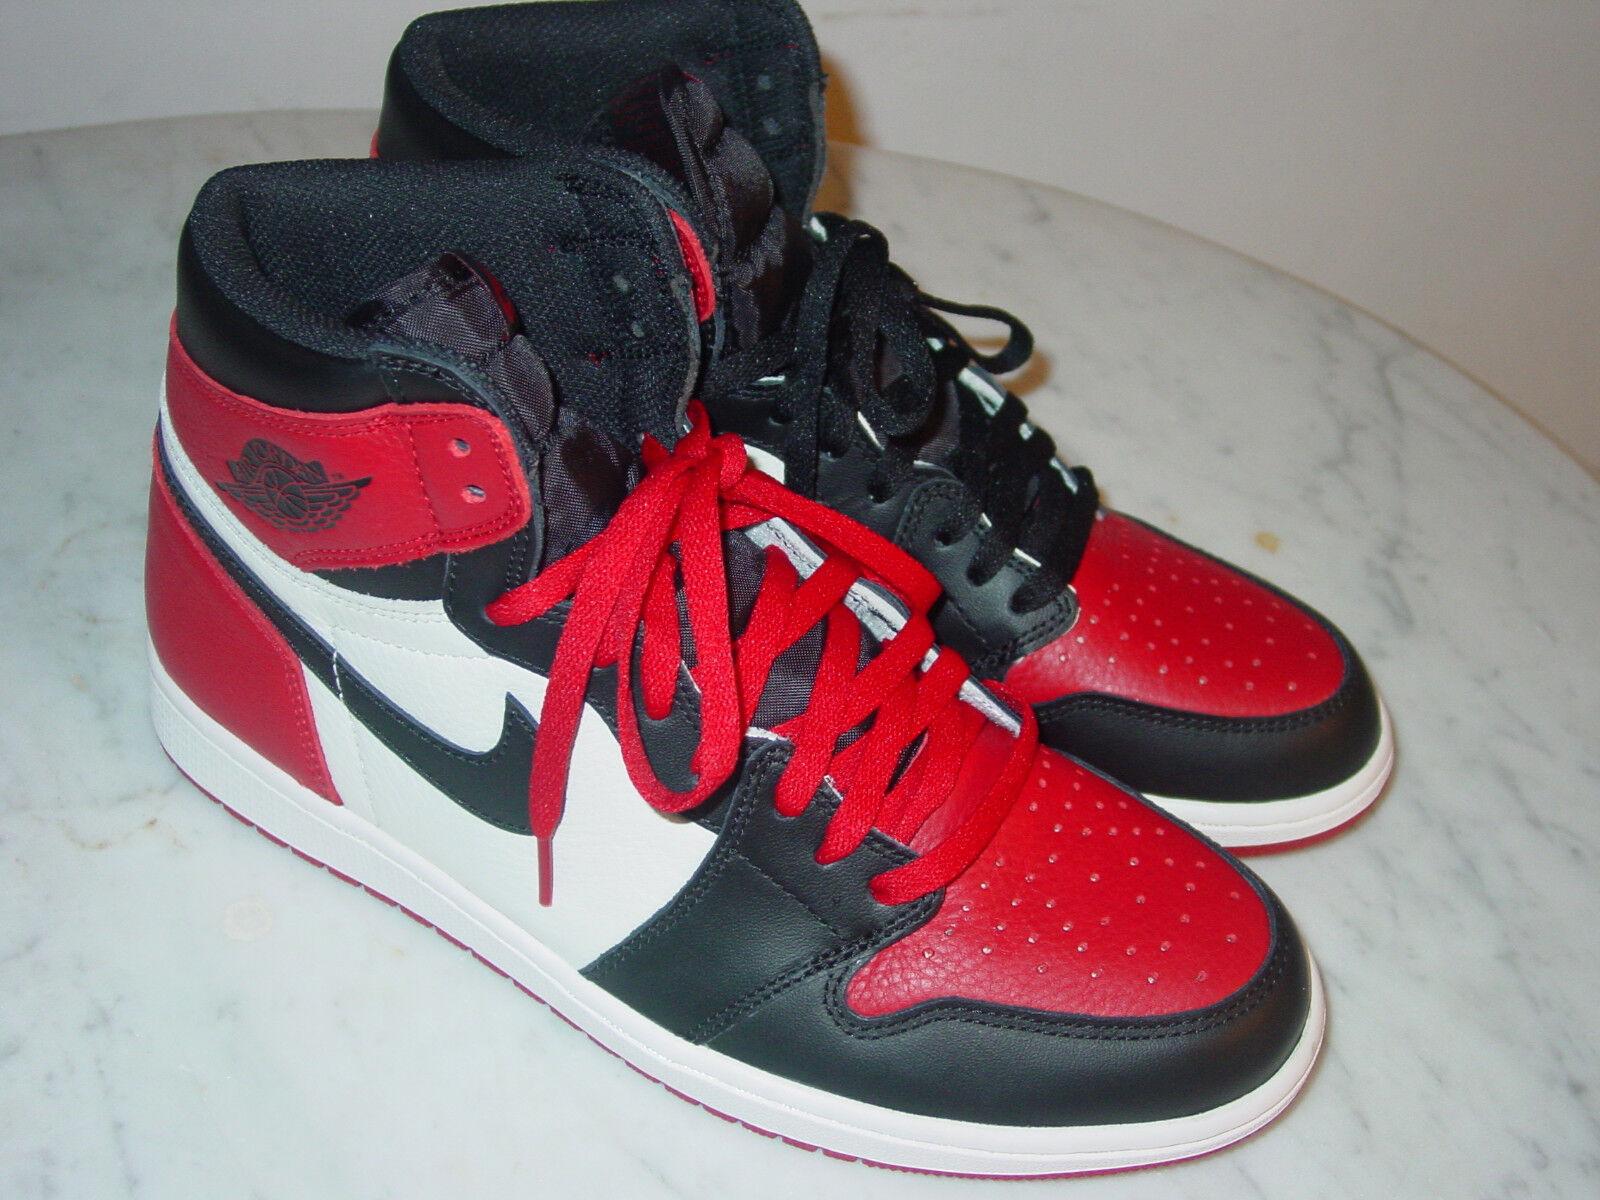 103fa0e610f 2017 Nike Air Jordan Retro 1 High OG Bred Toe Gym Red Black shoes Size 10.5